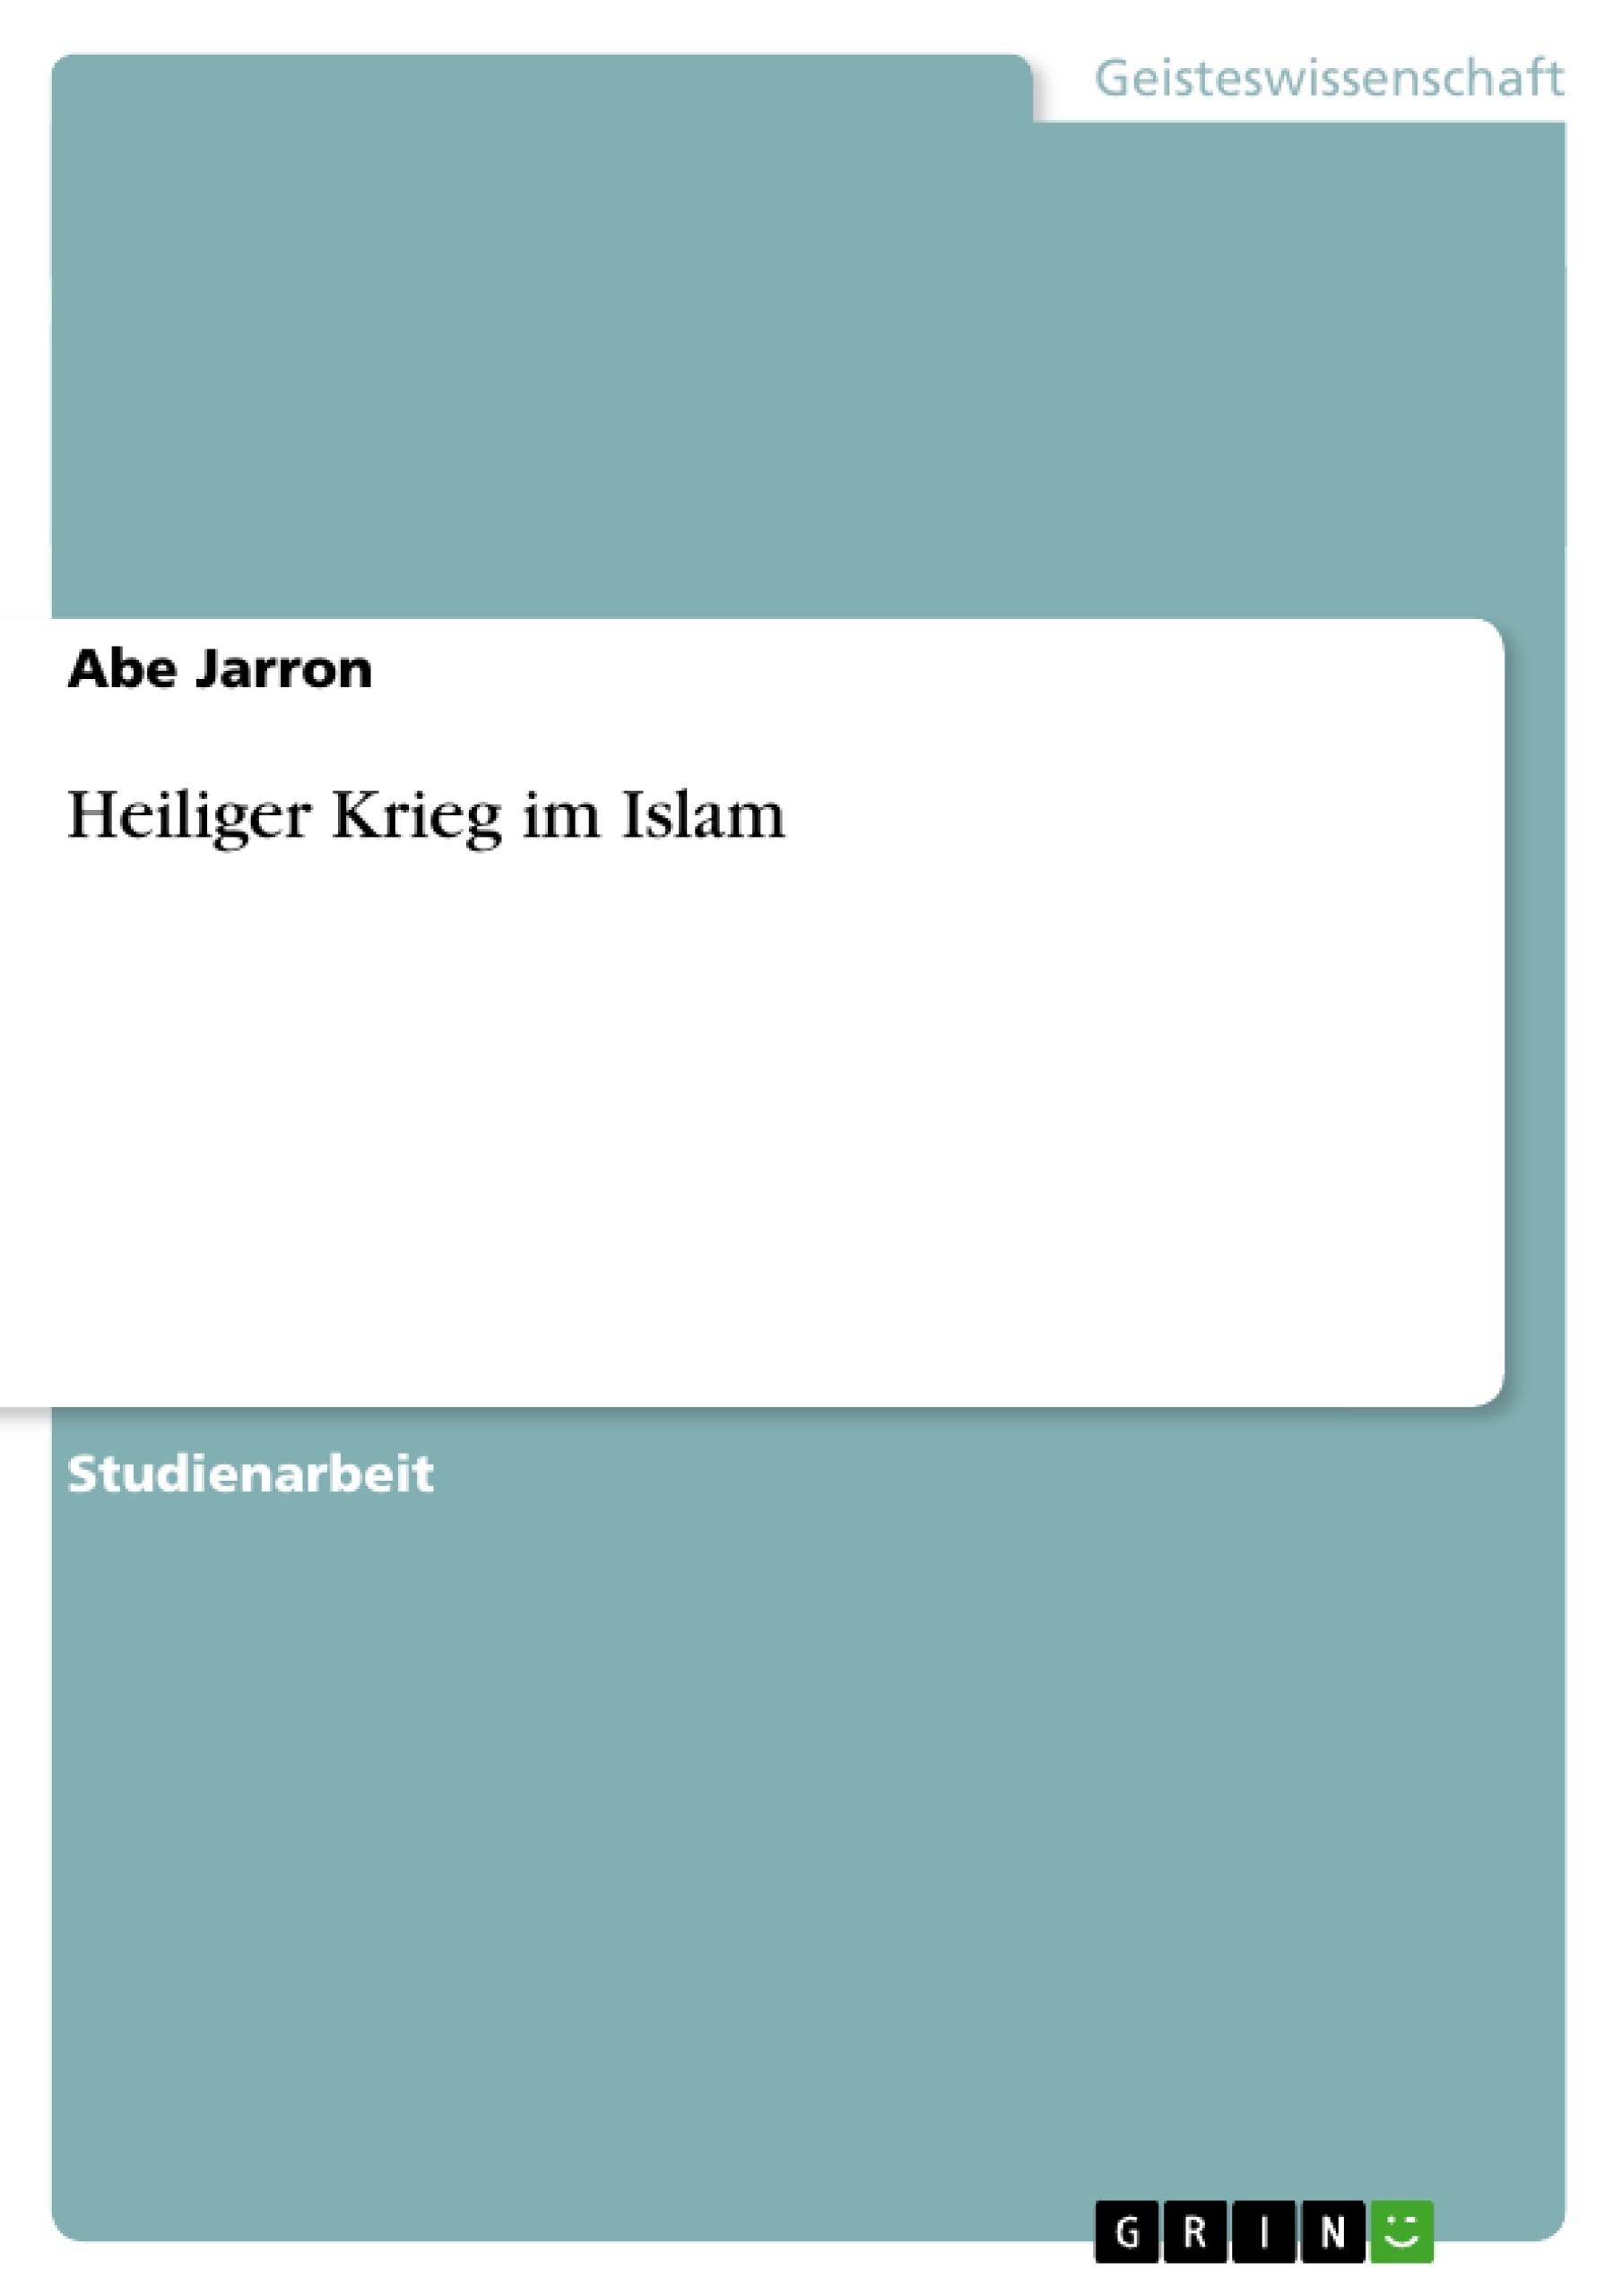 Titel: Heiliger Krieg im Islam